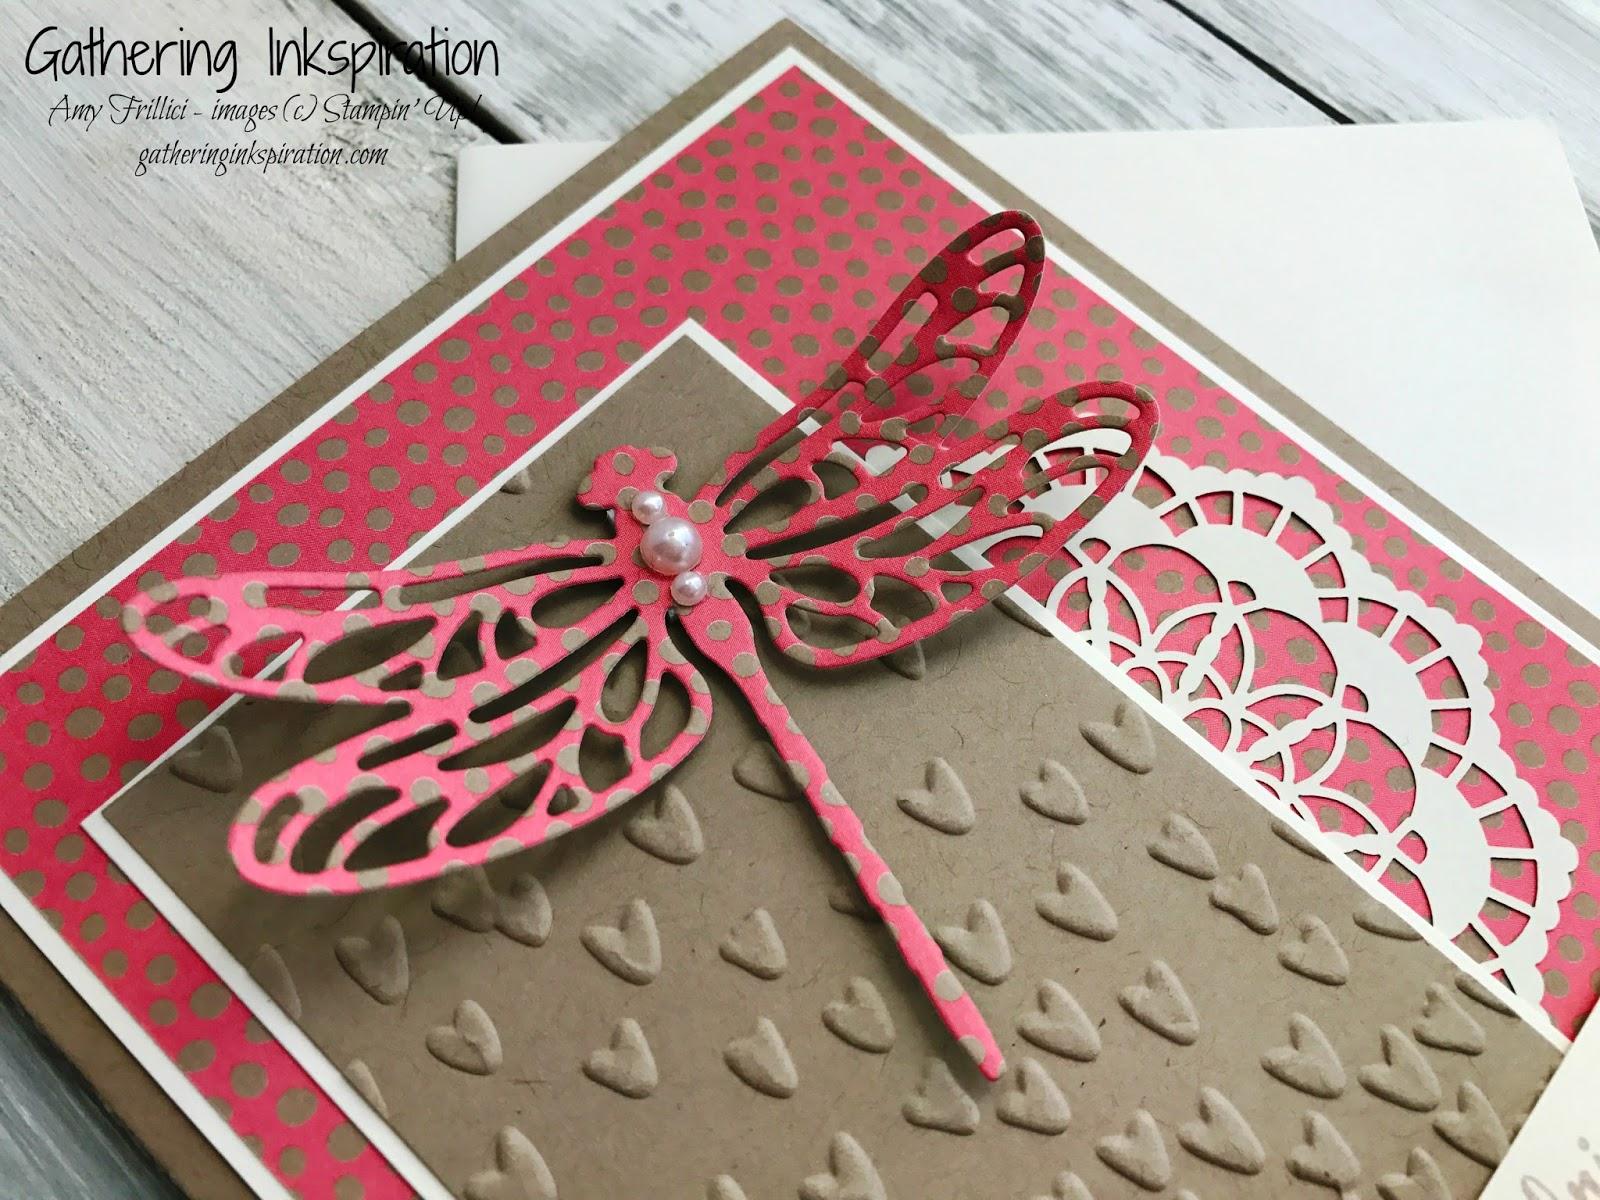 Gathering Inkspiration: Stampin\' Up! Dragonfly Dreams